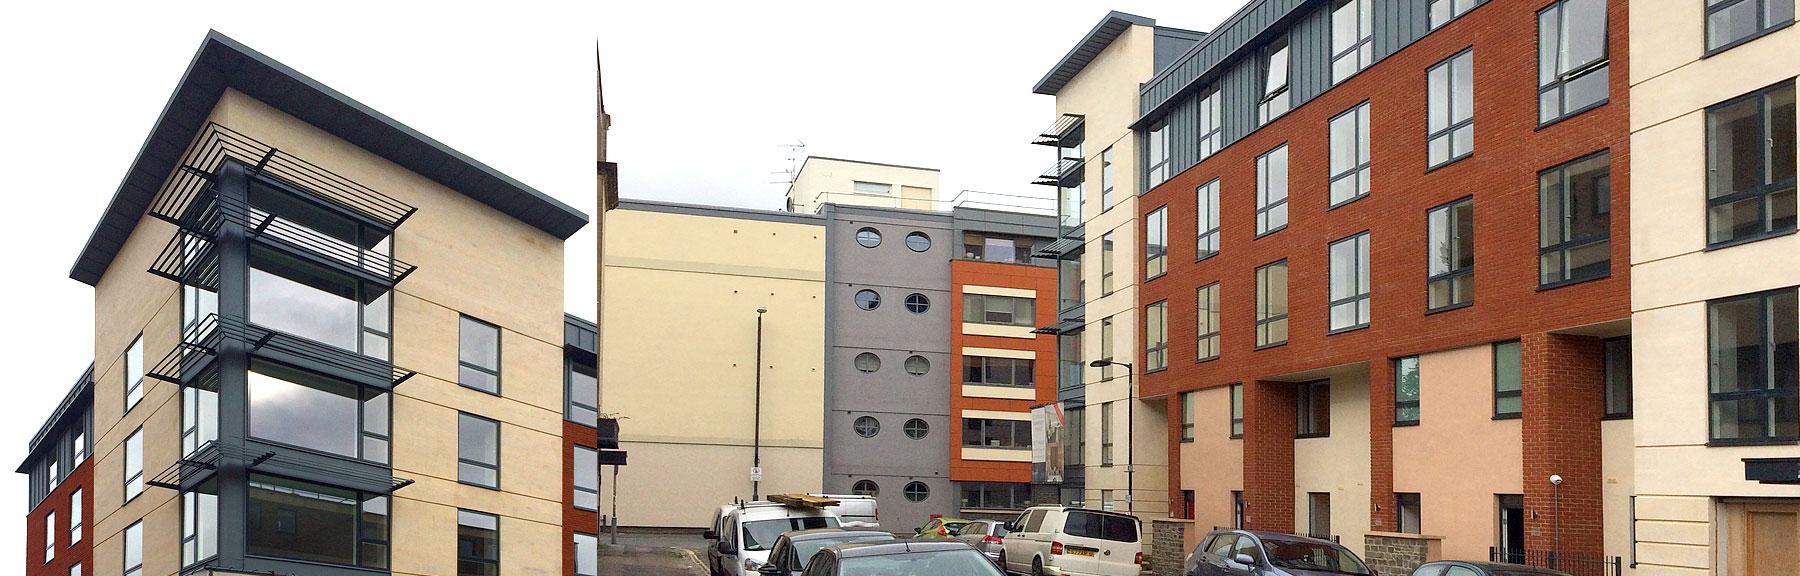 Portland View Bristol